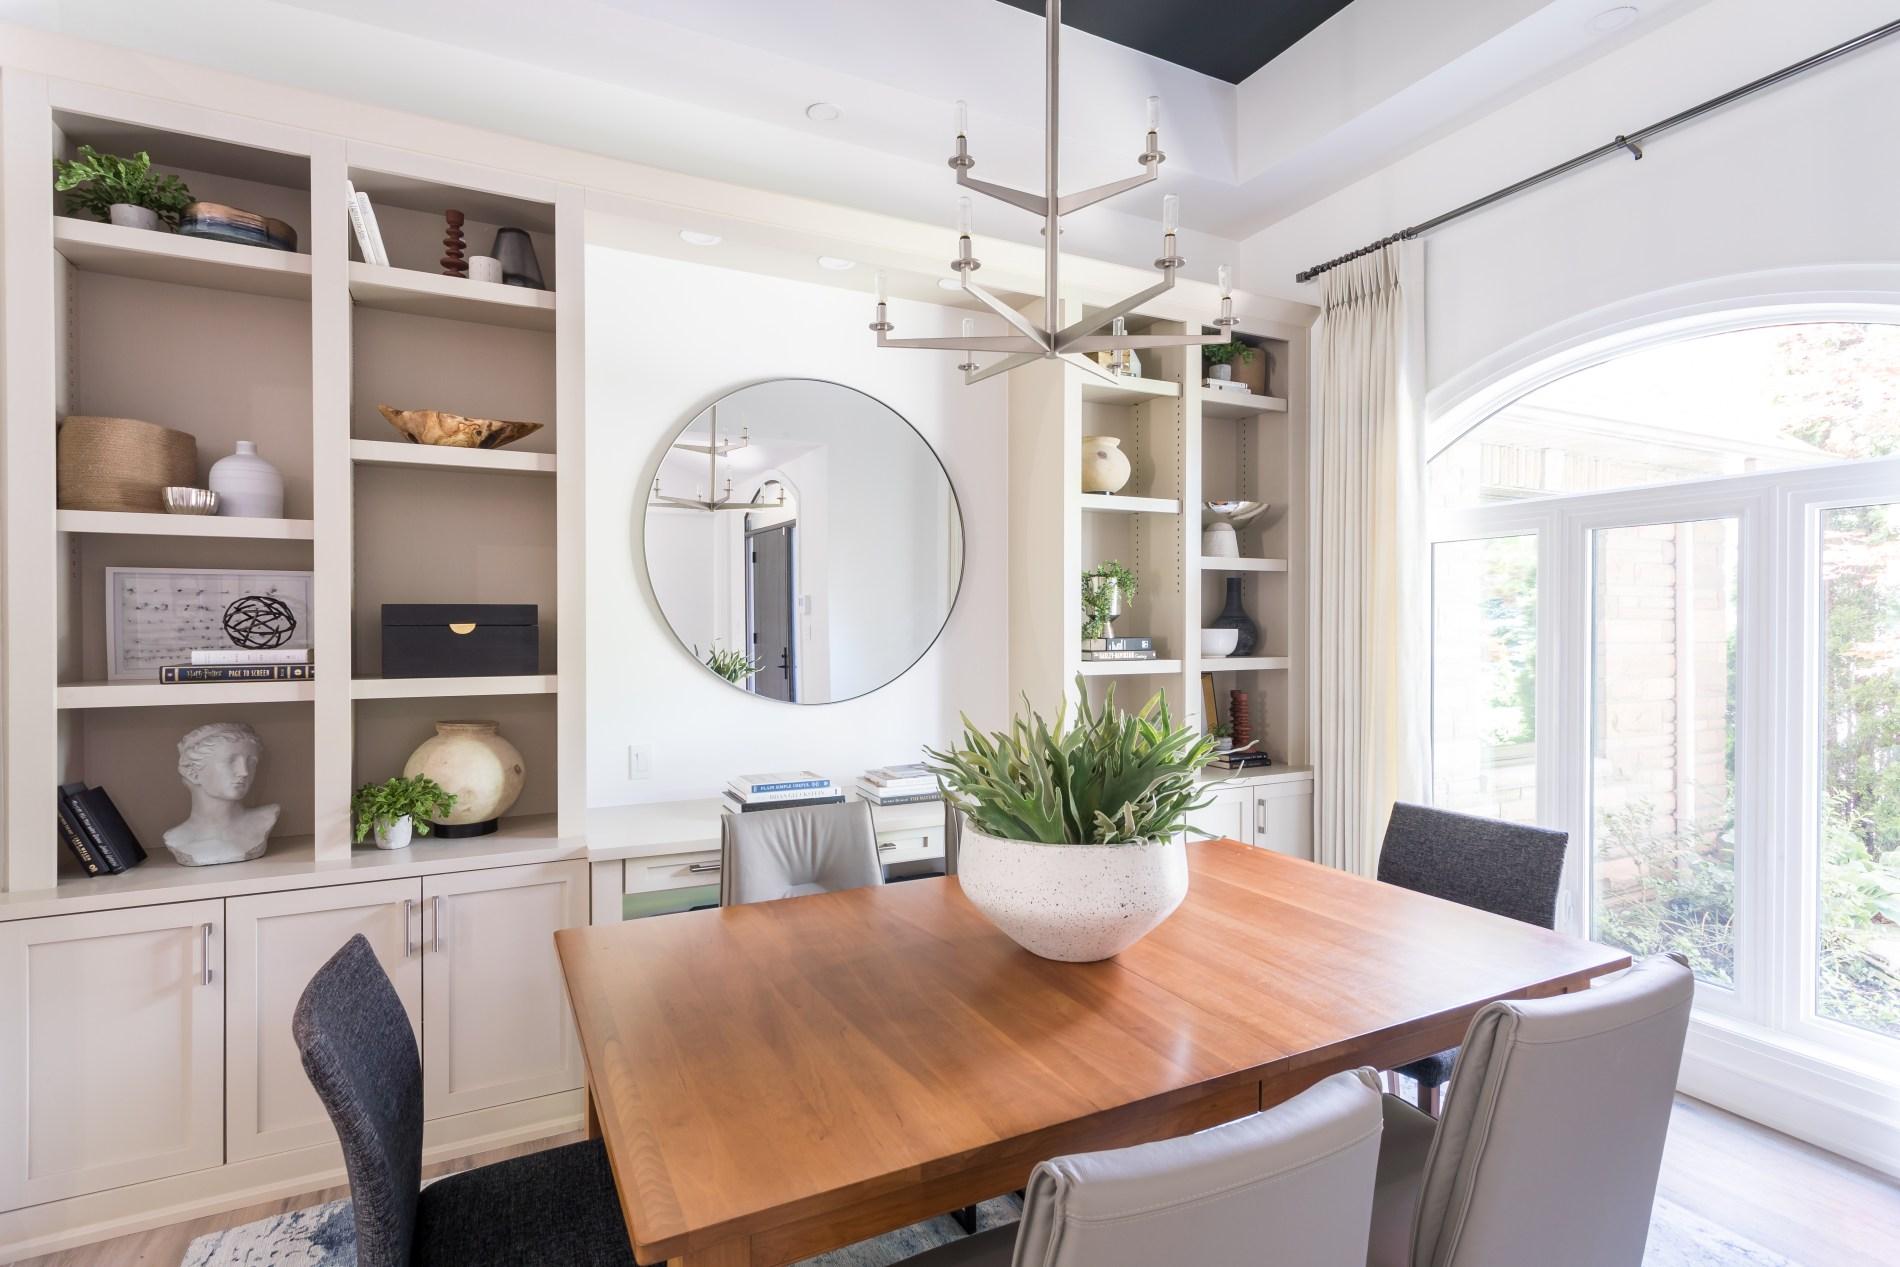 Harper Designs - Highvalley Dining Room 2